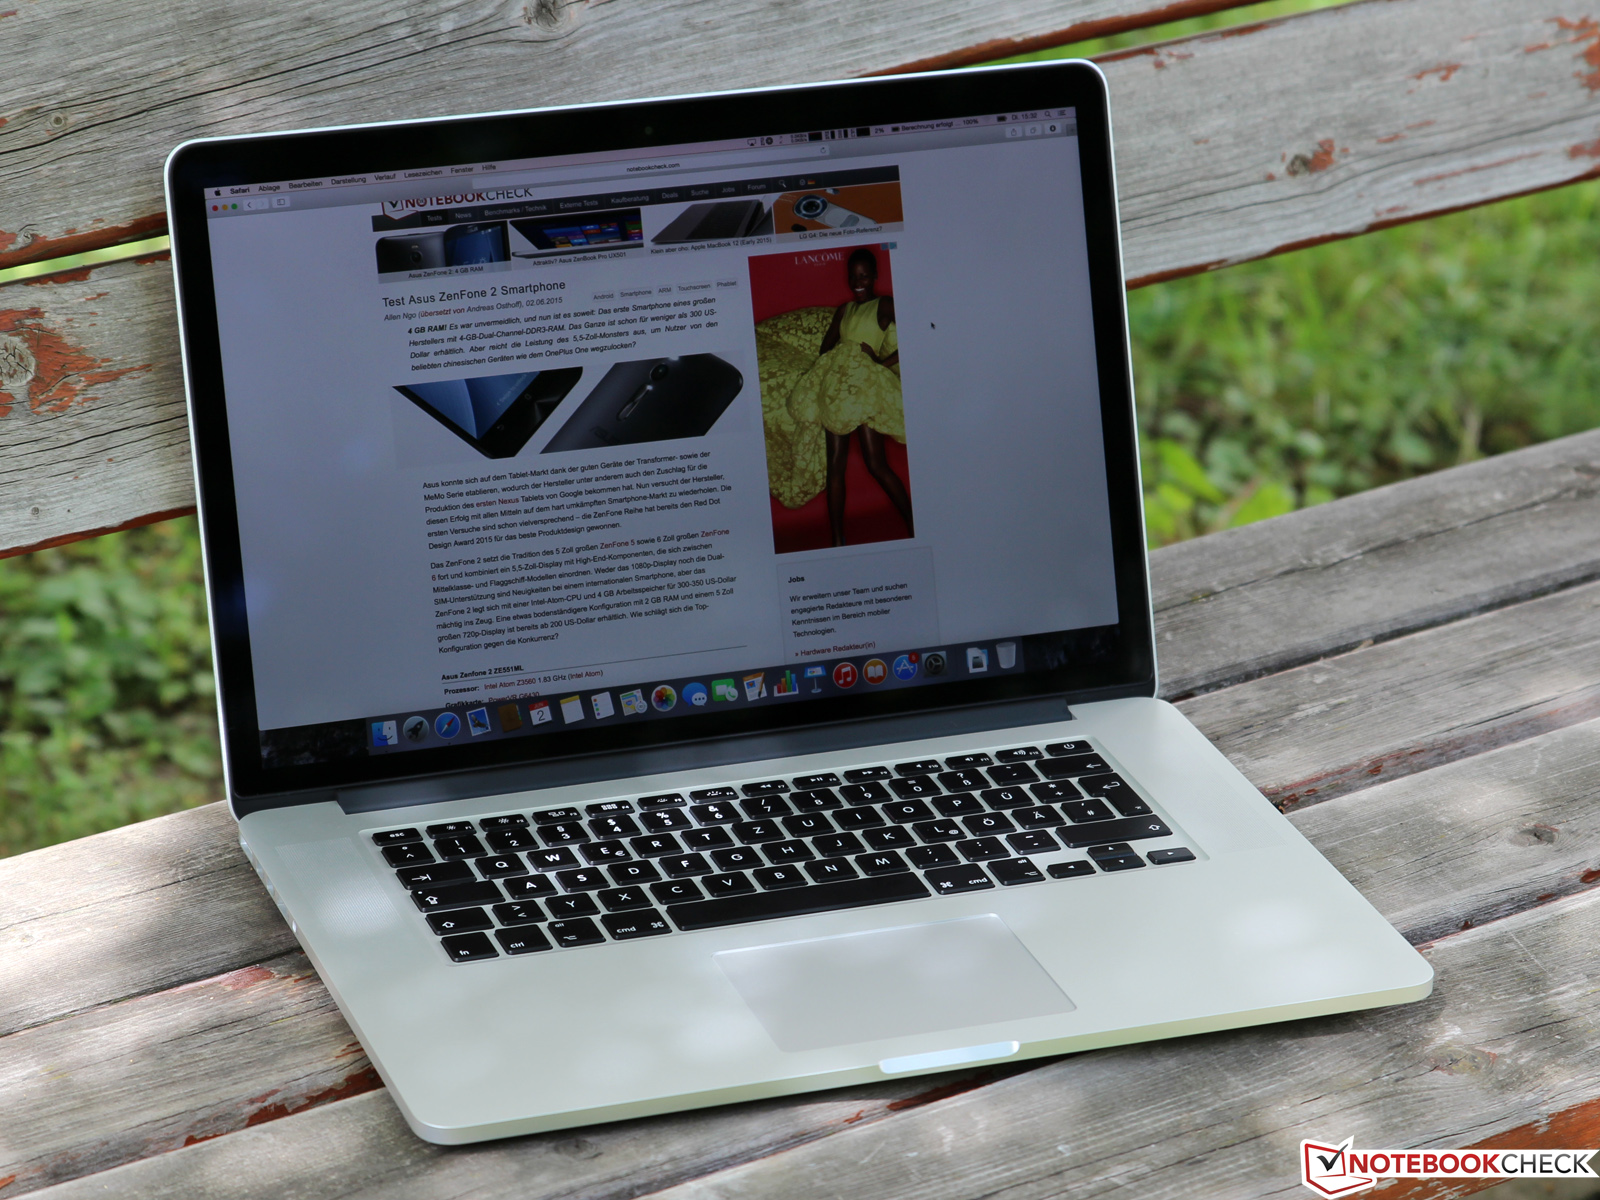 critique compl te du pc portable apple macbook pro retina 15 mi 2015. Black Bedroom Furniture Sets. Home Design Ideas